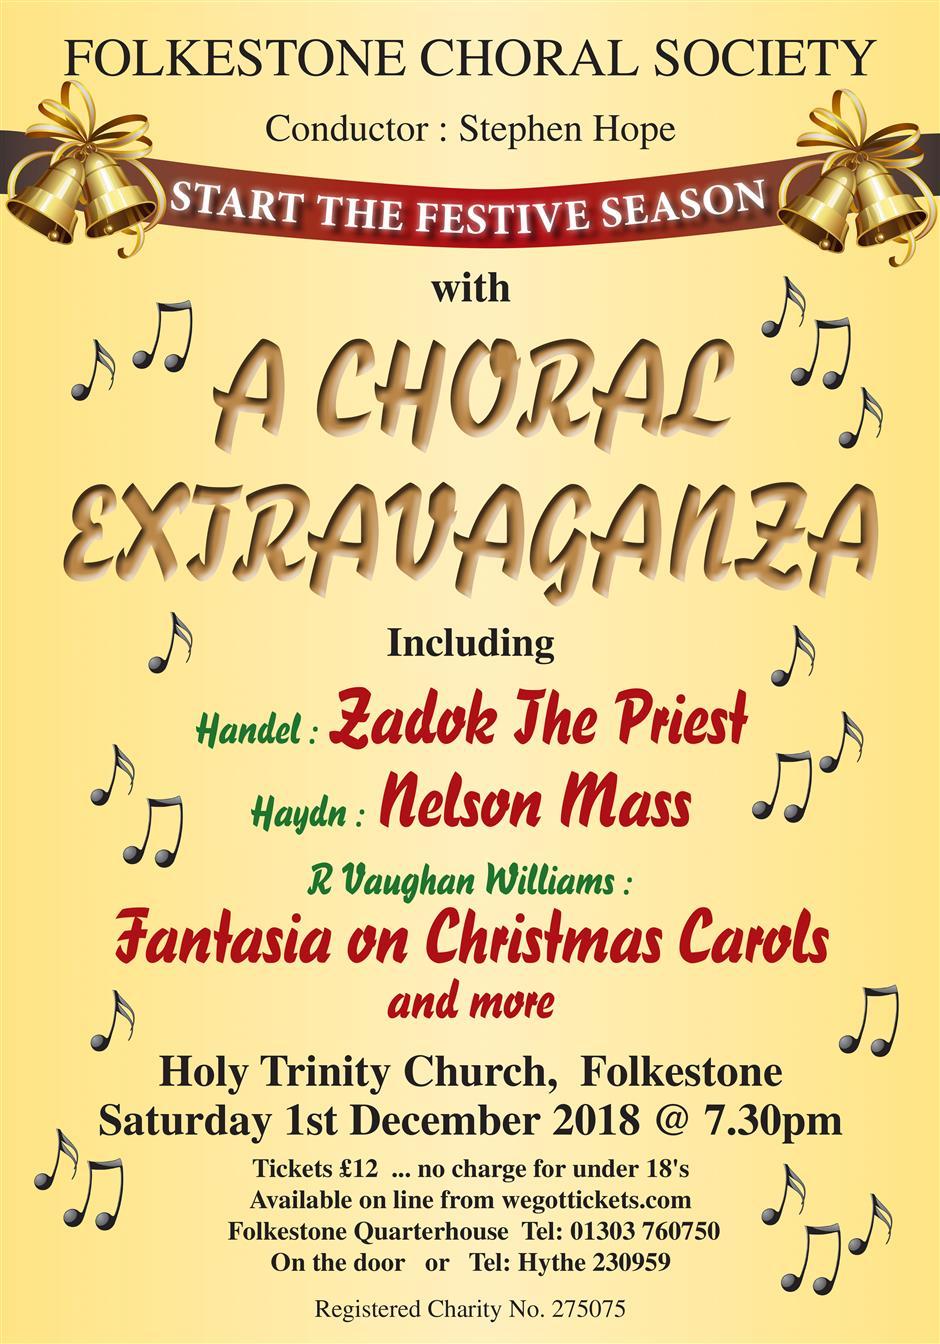 Folkestone Choral Society Concert: